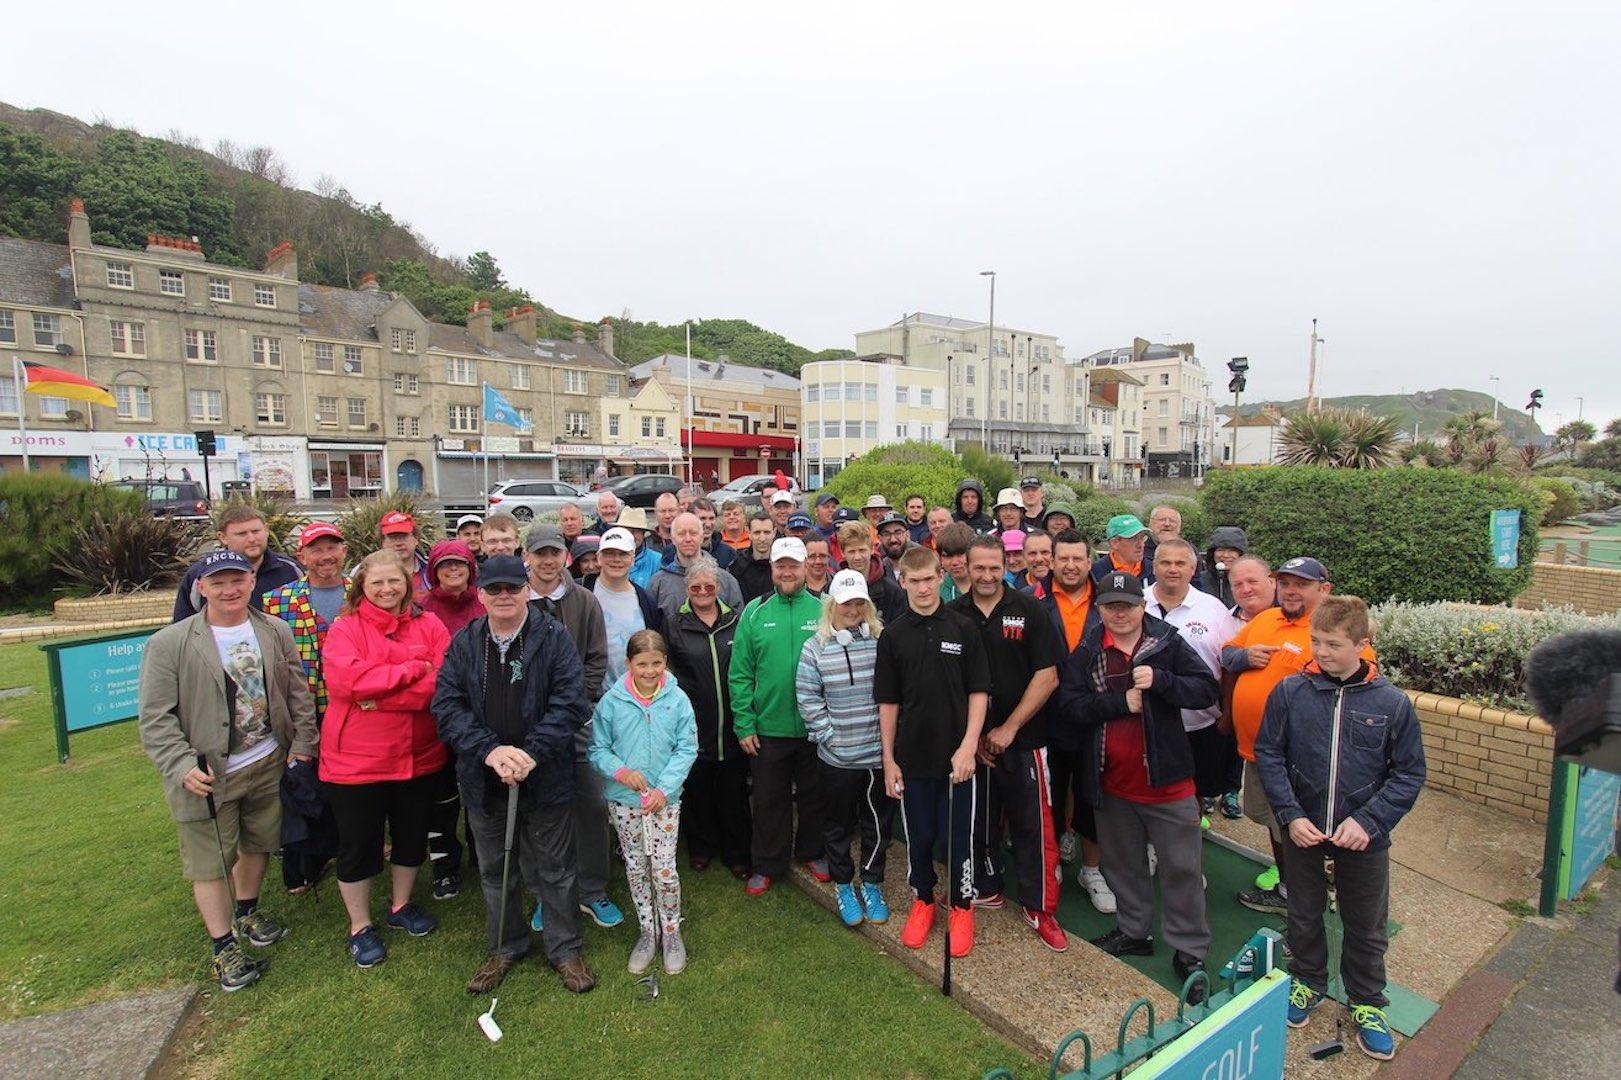 Mini Golf competitors at the World Crazy Golf Championships